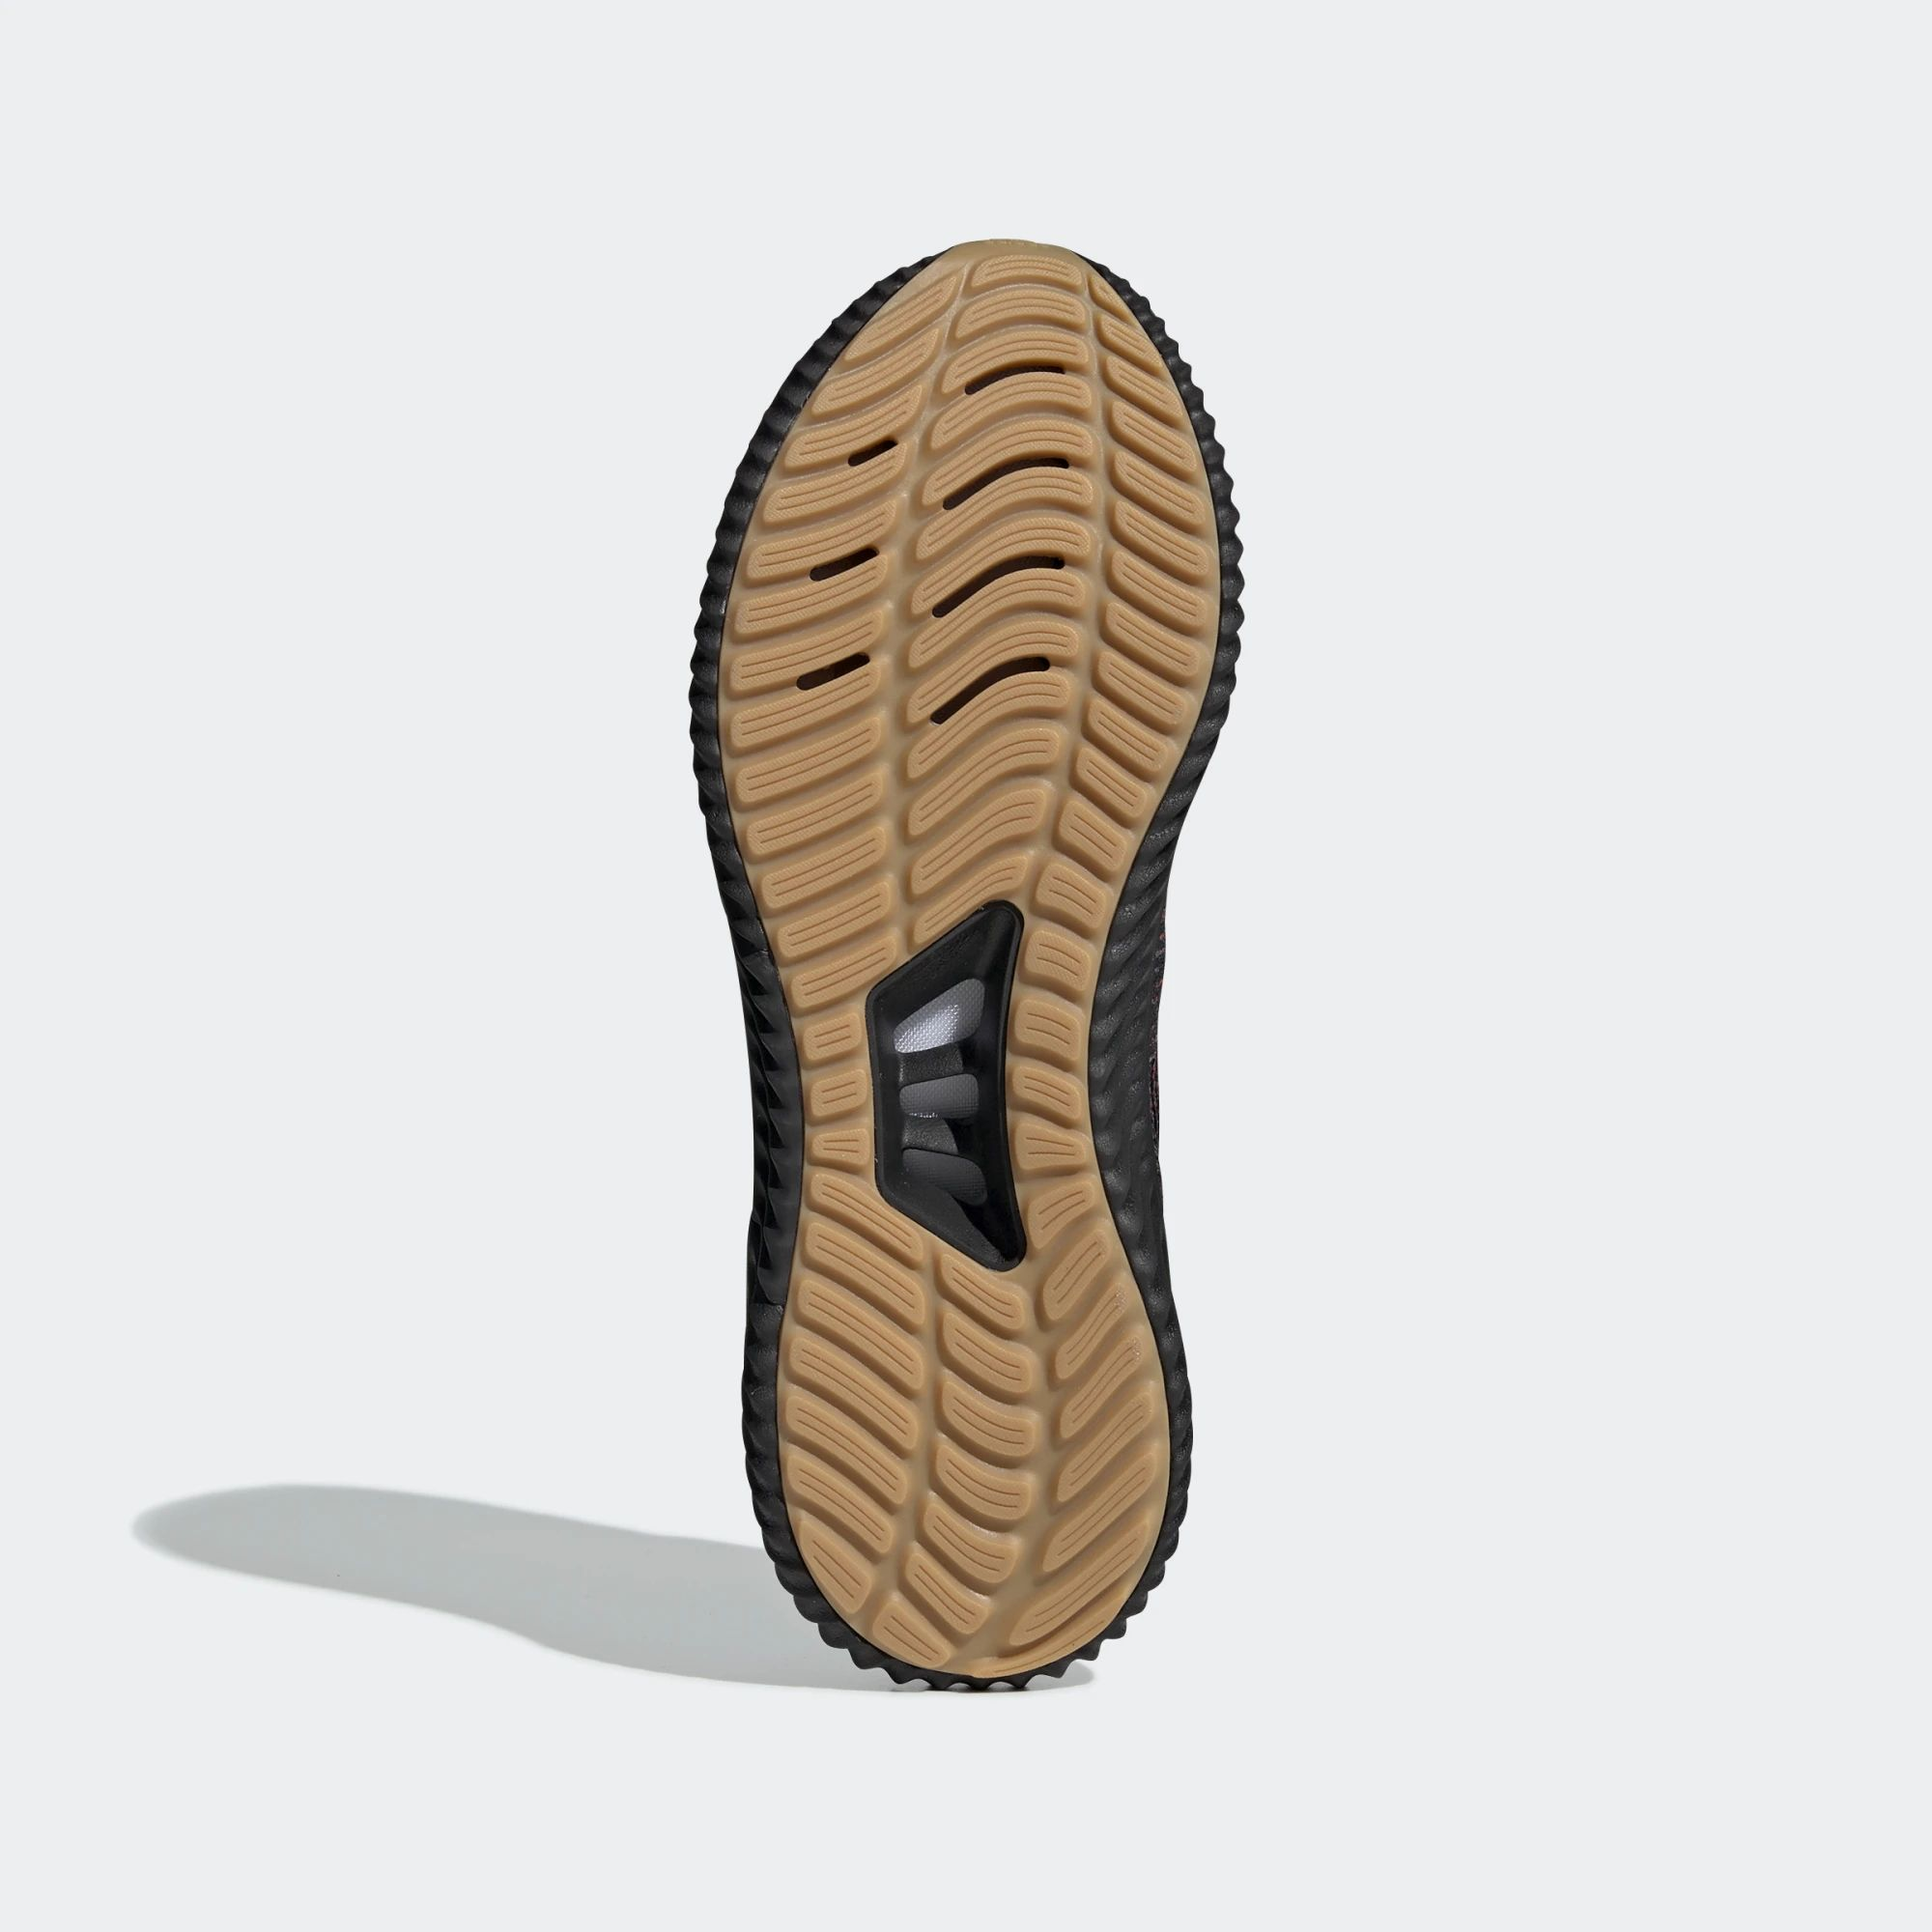 8d5a0085131bb ... Click to enlarge image  adidas nemeziz tango 18 1 trainers core black core black active red g.jpg  ...